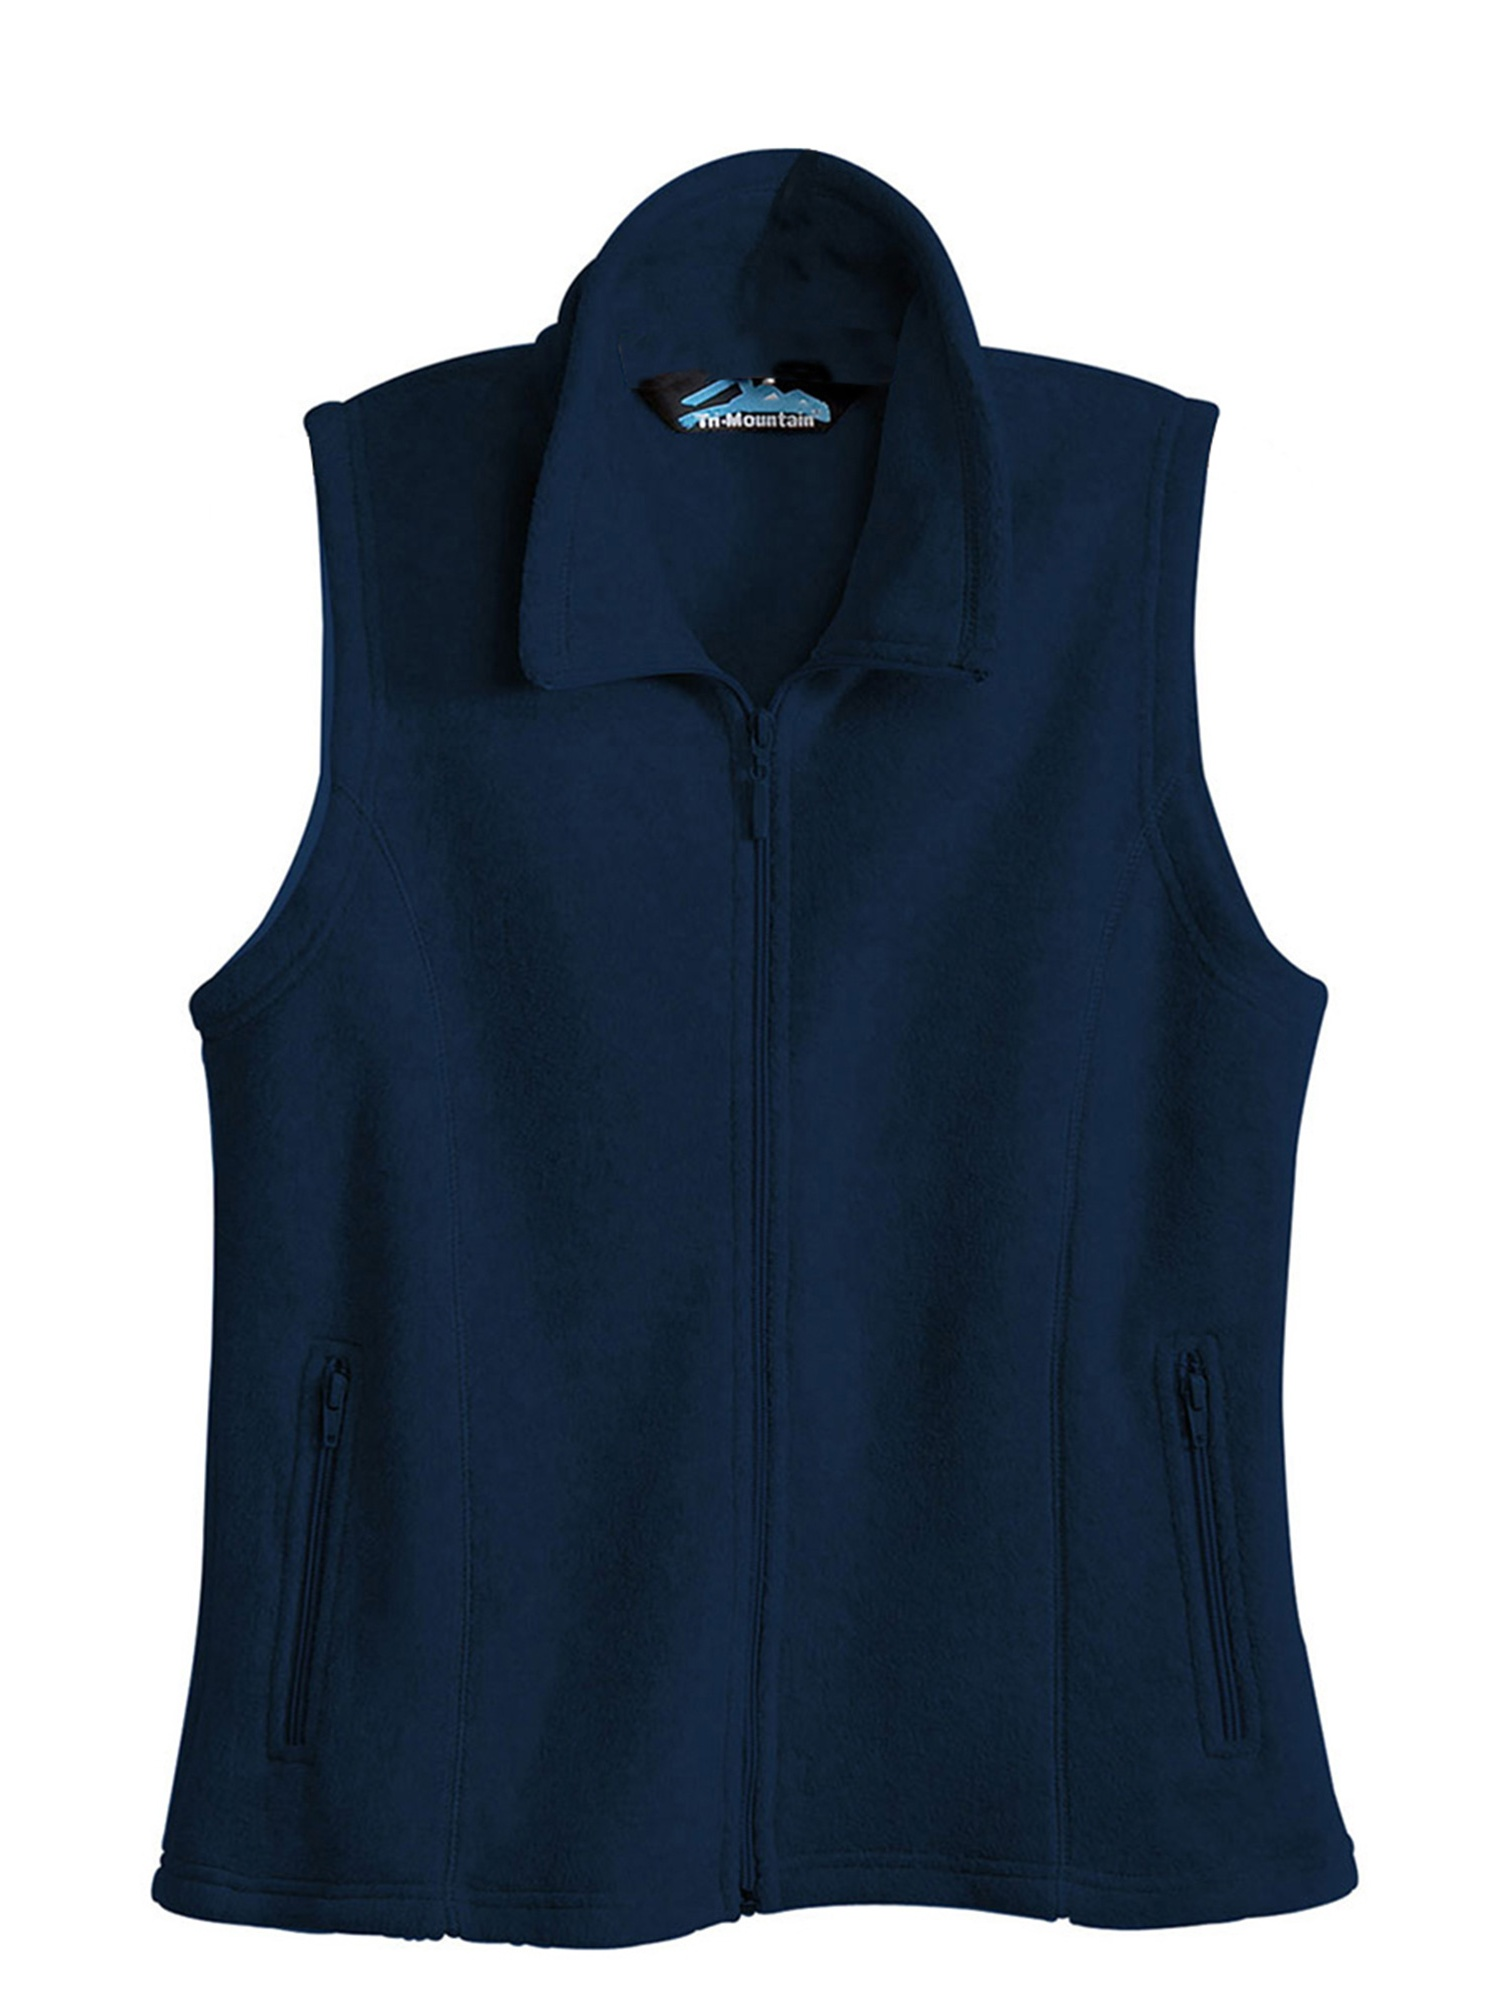 Tri-Mountain Women's Tailored Fit Fashion Fleece Vest